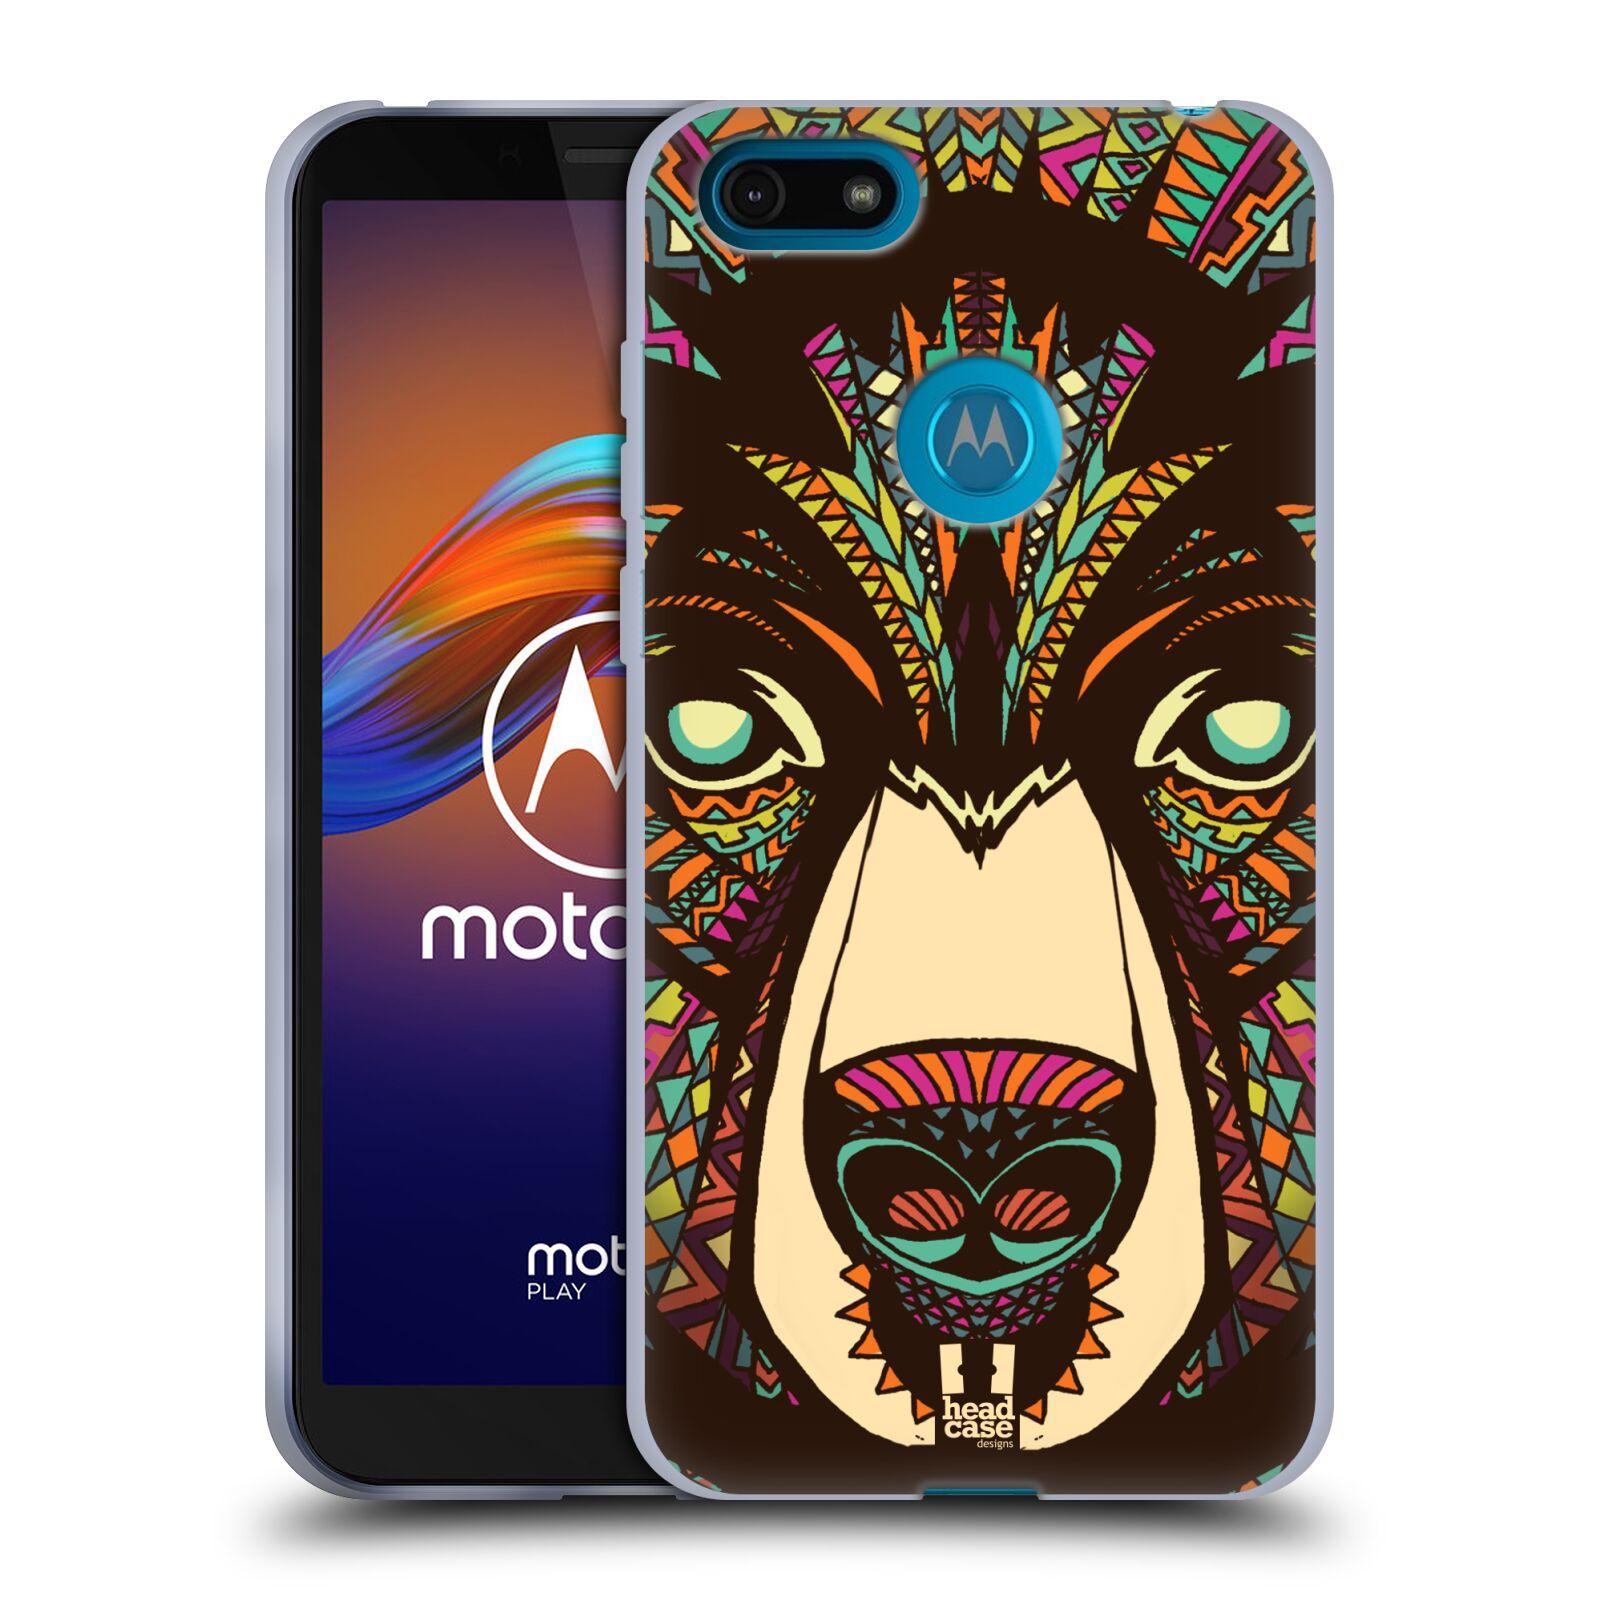 Silikonové pouzdro na mobil Motorola Moto E6 Play - Head Case - AZTEC MEDVĚD